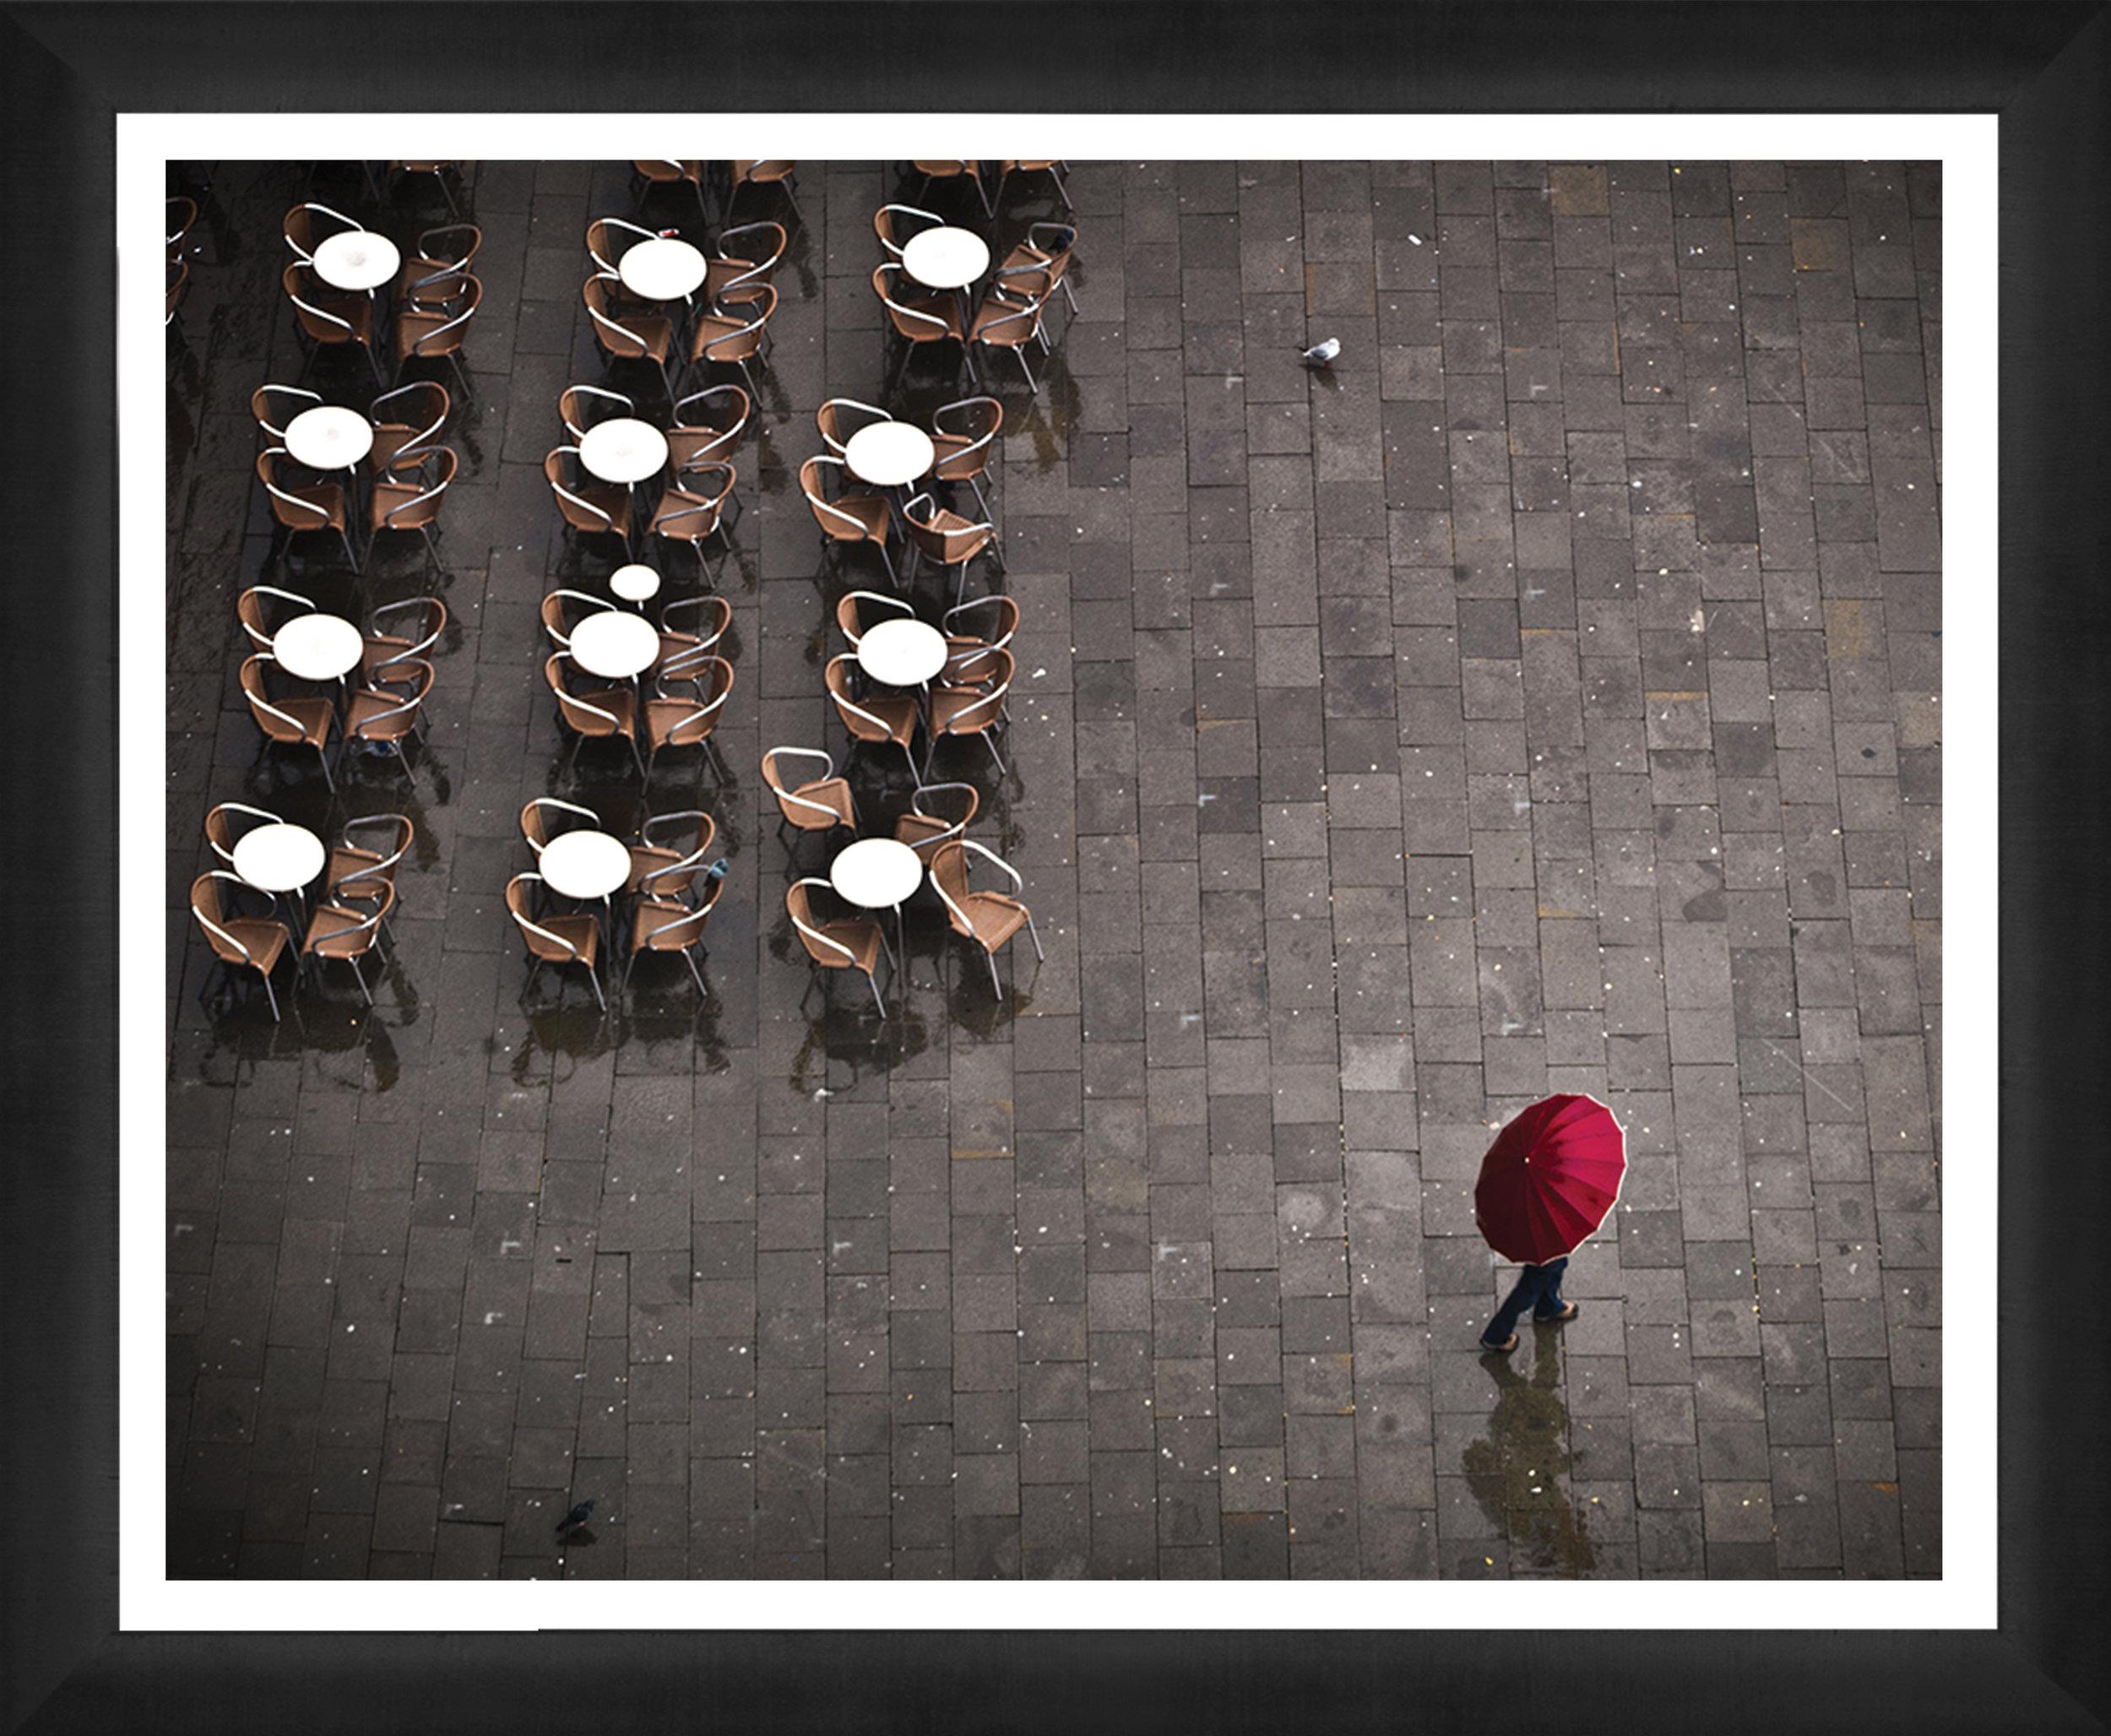 The-Umbrella.jpg